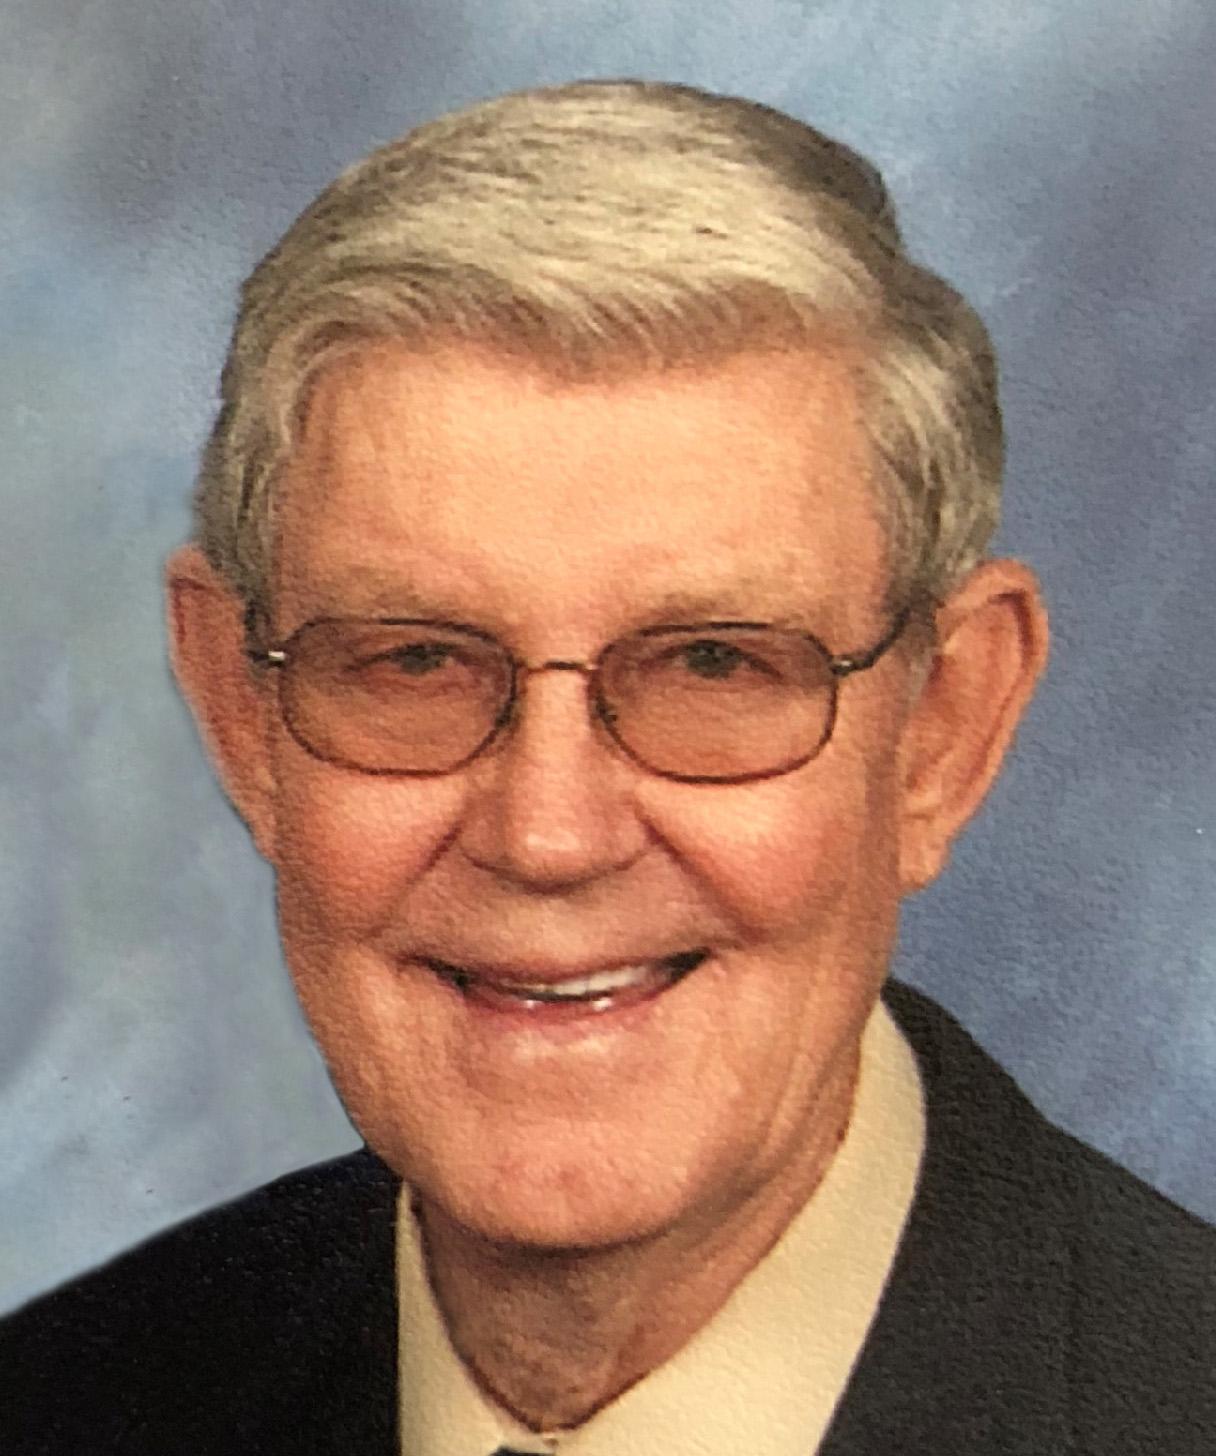 Gary William Yelken, 82 years of age, of Gretna, Nebraska, formerly of Holdrege